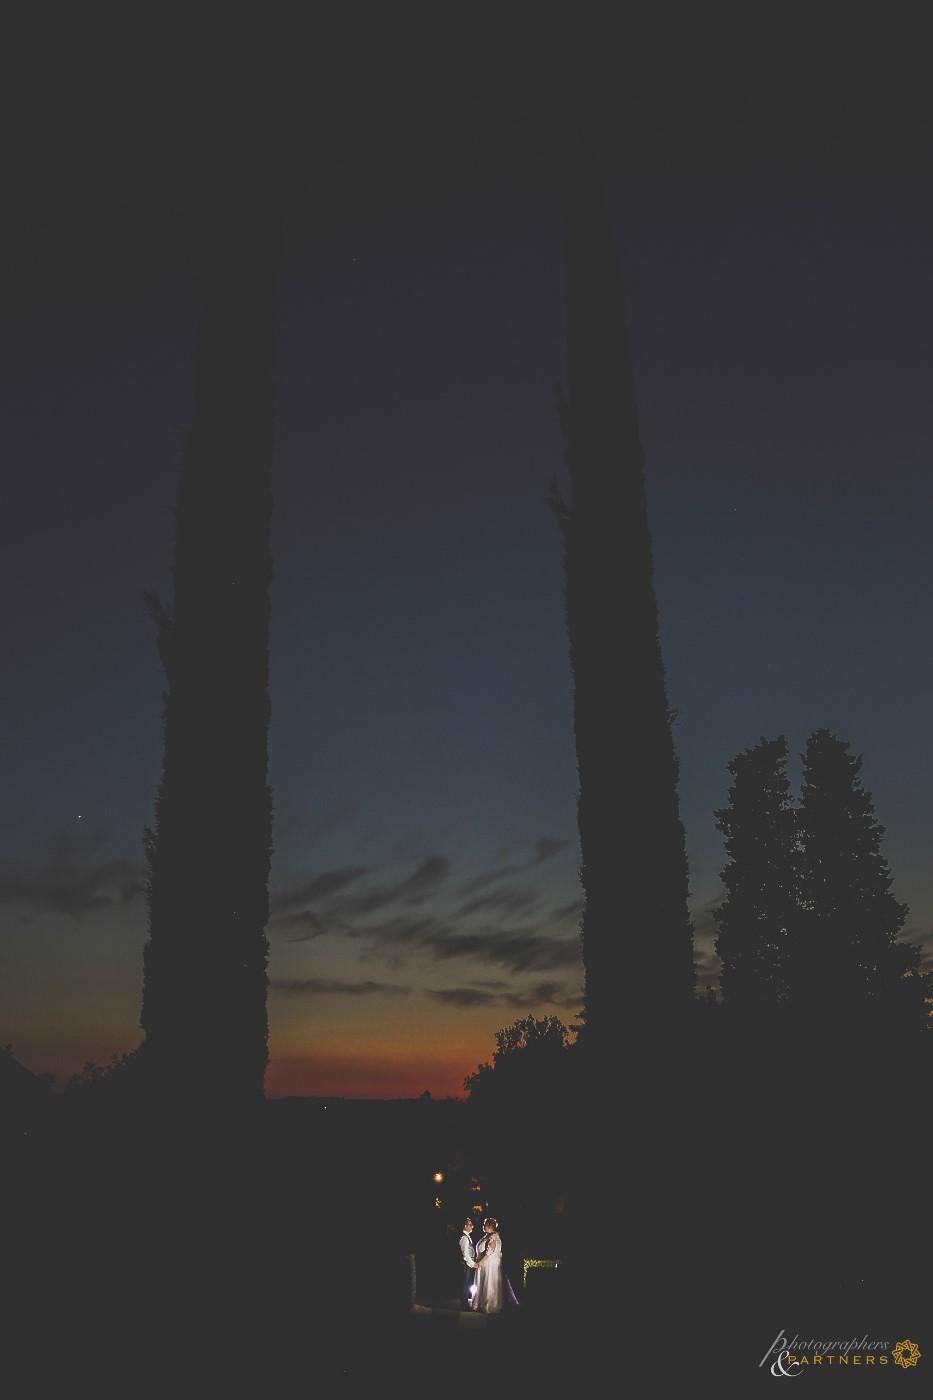 The blue hour.